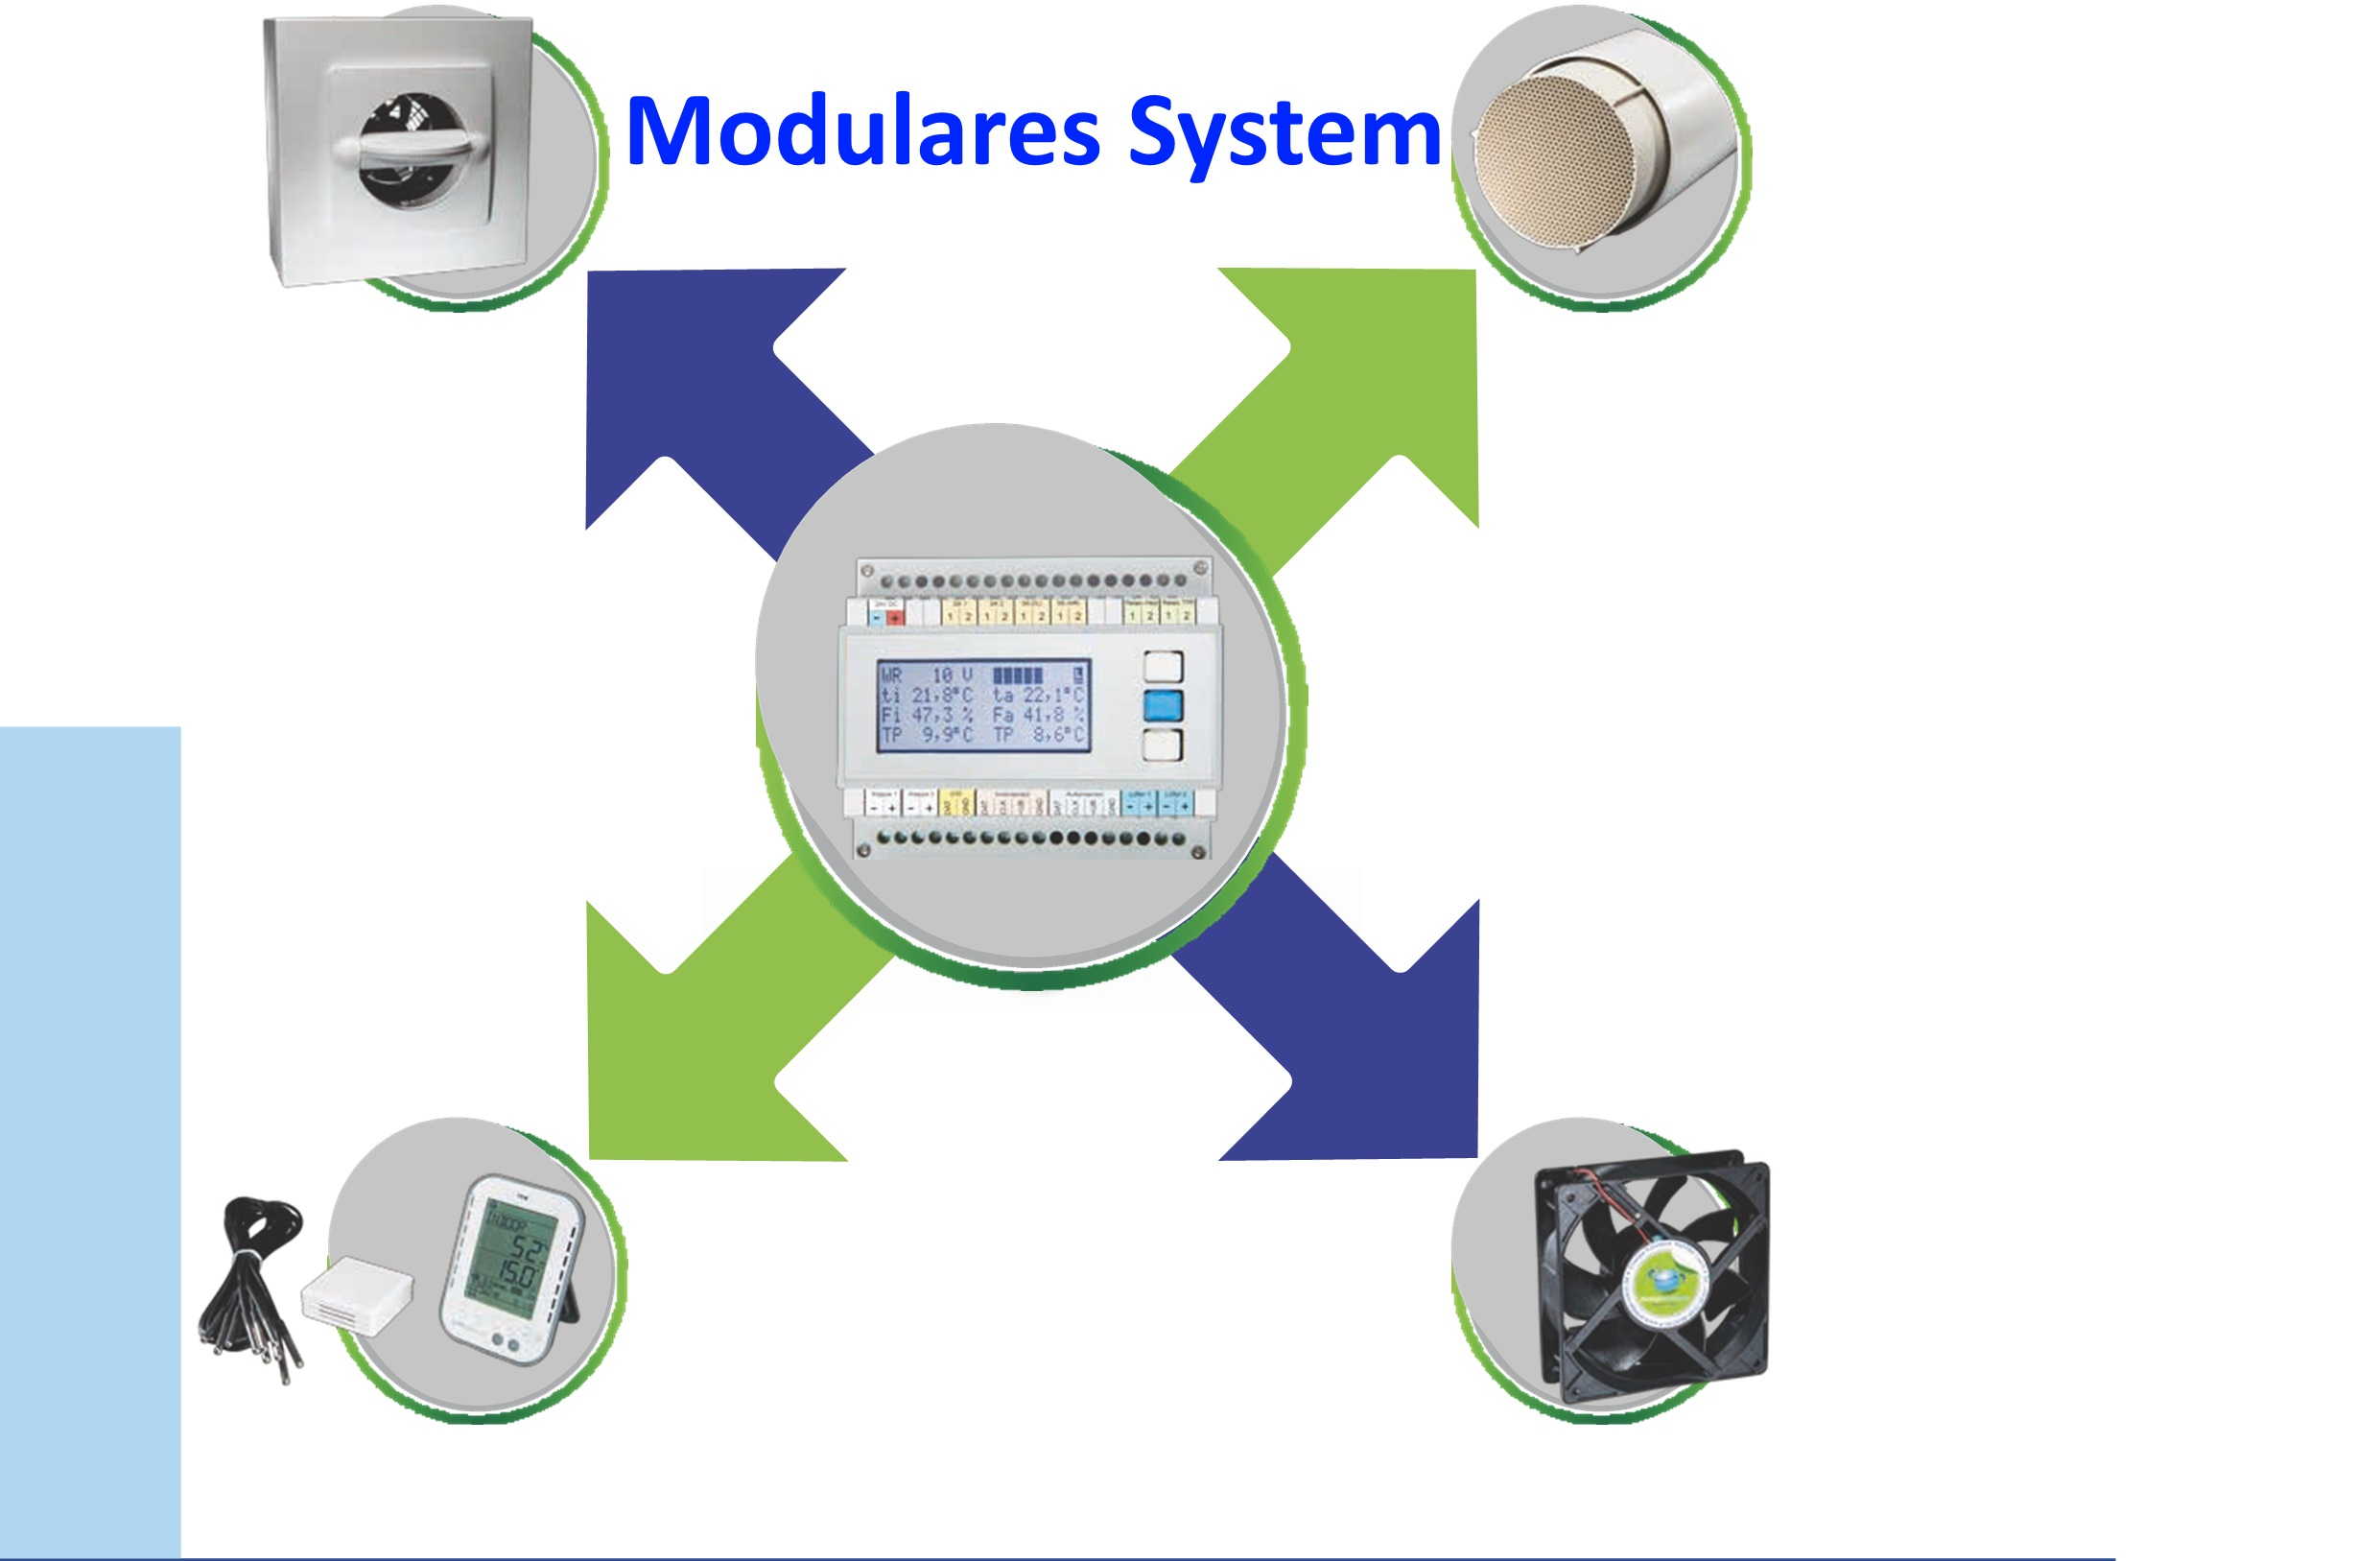 Modulares System